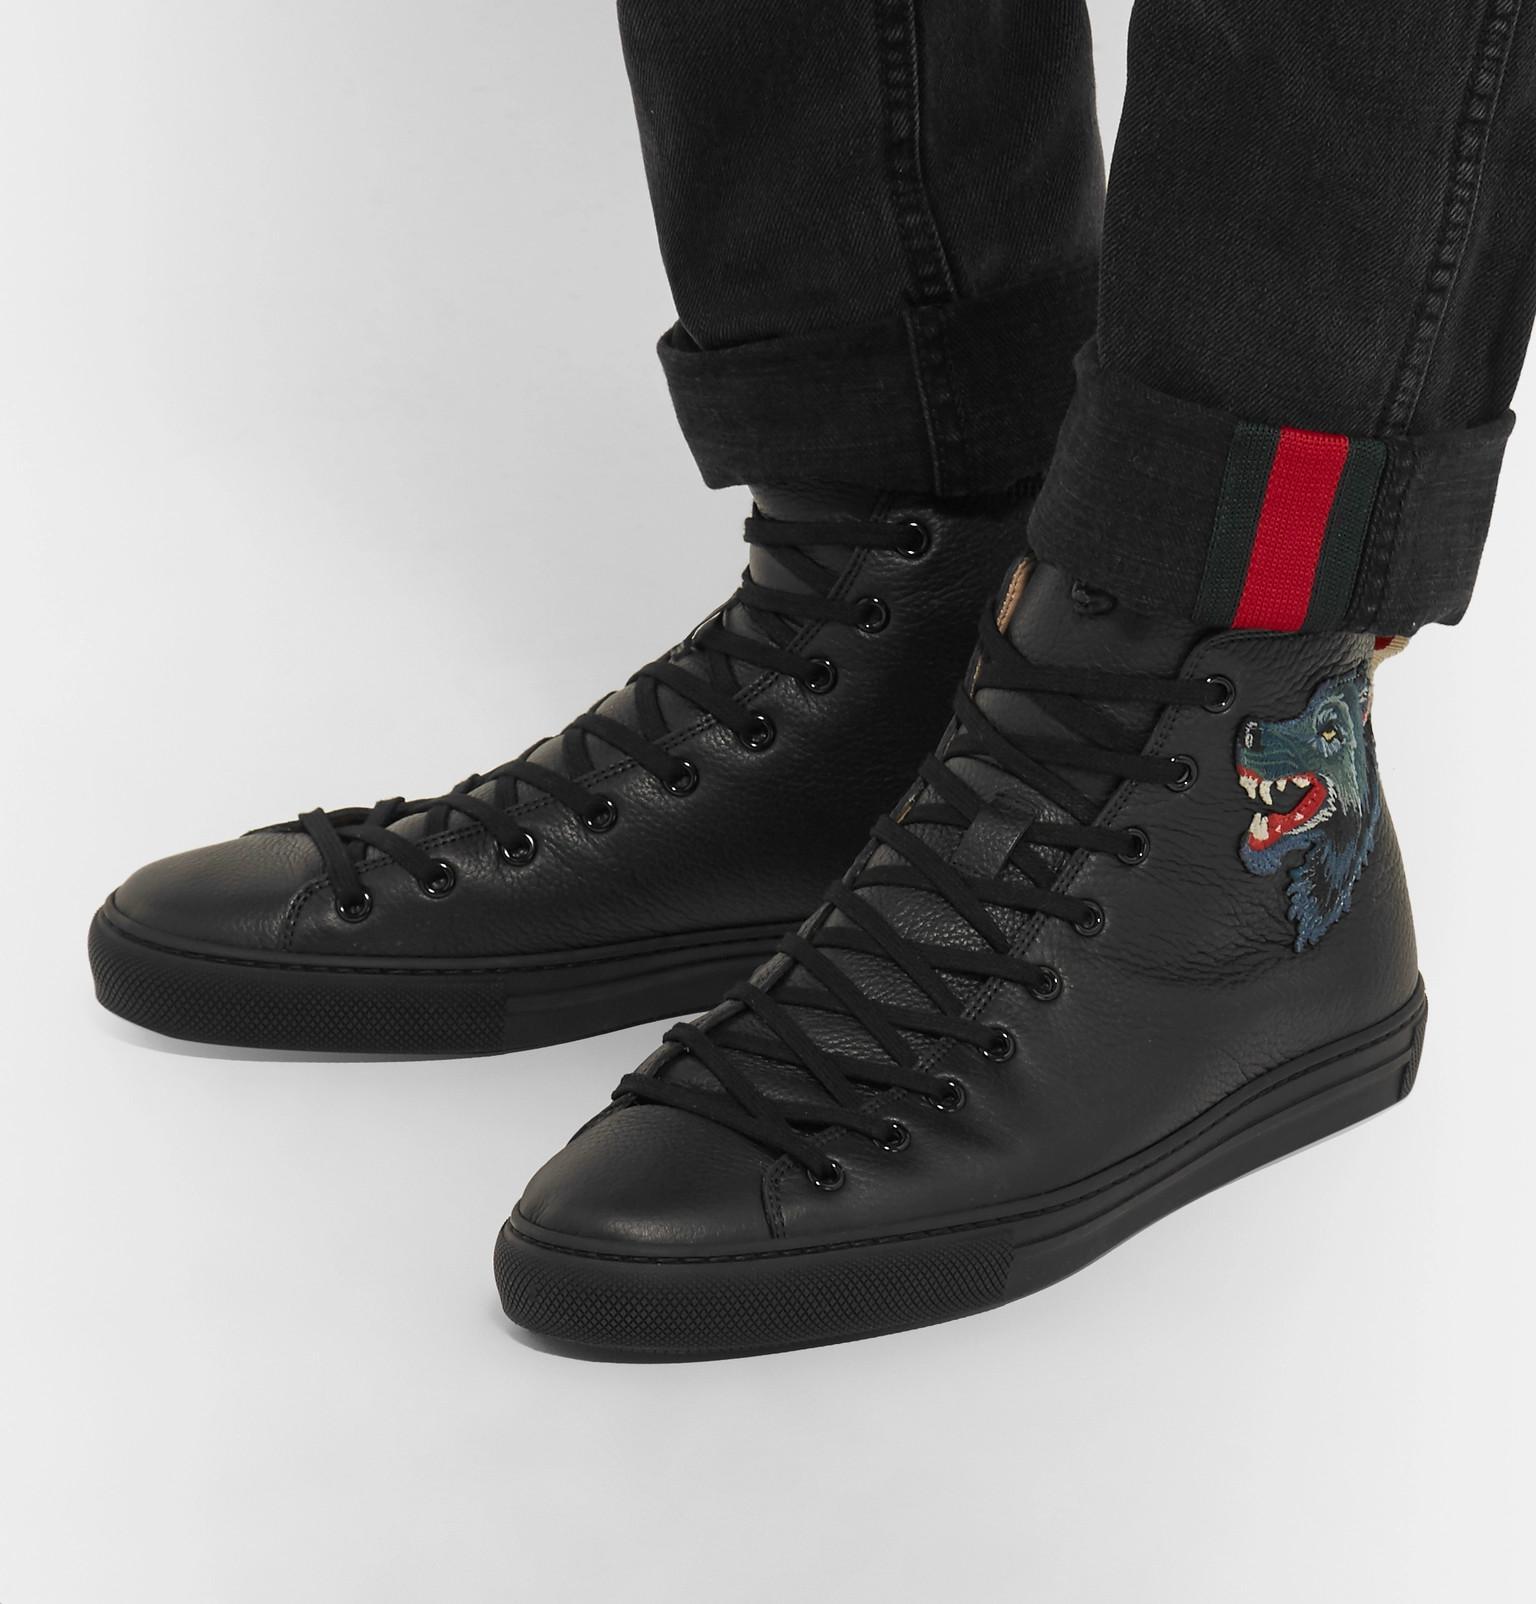 Full-grain Leather High-top Sneakers